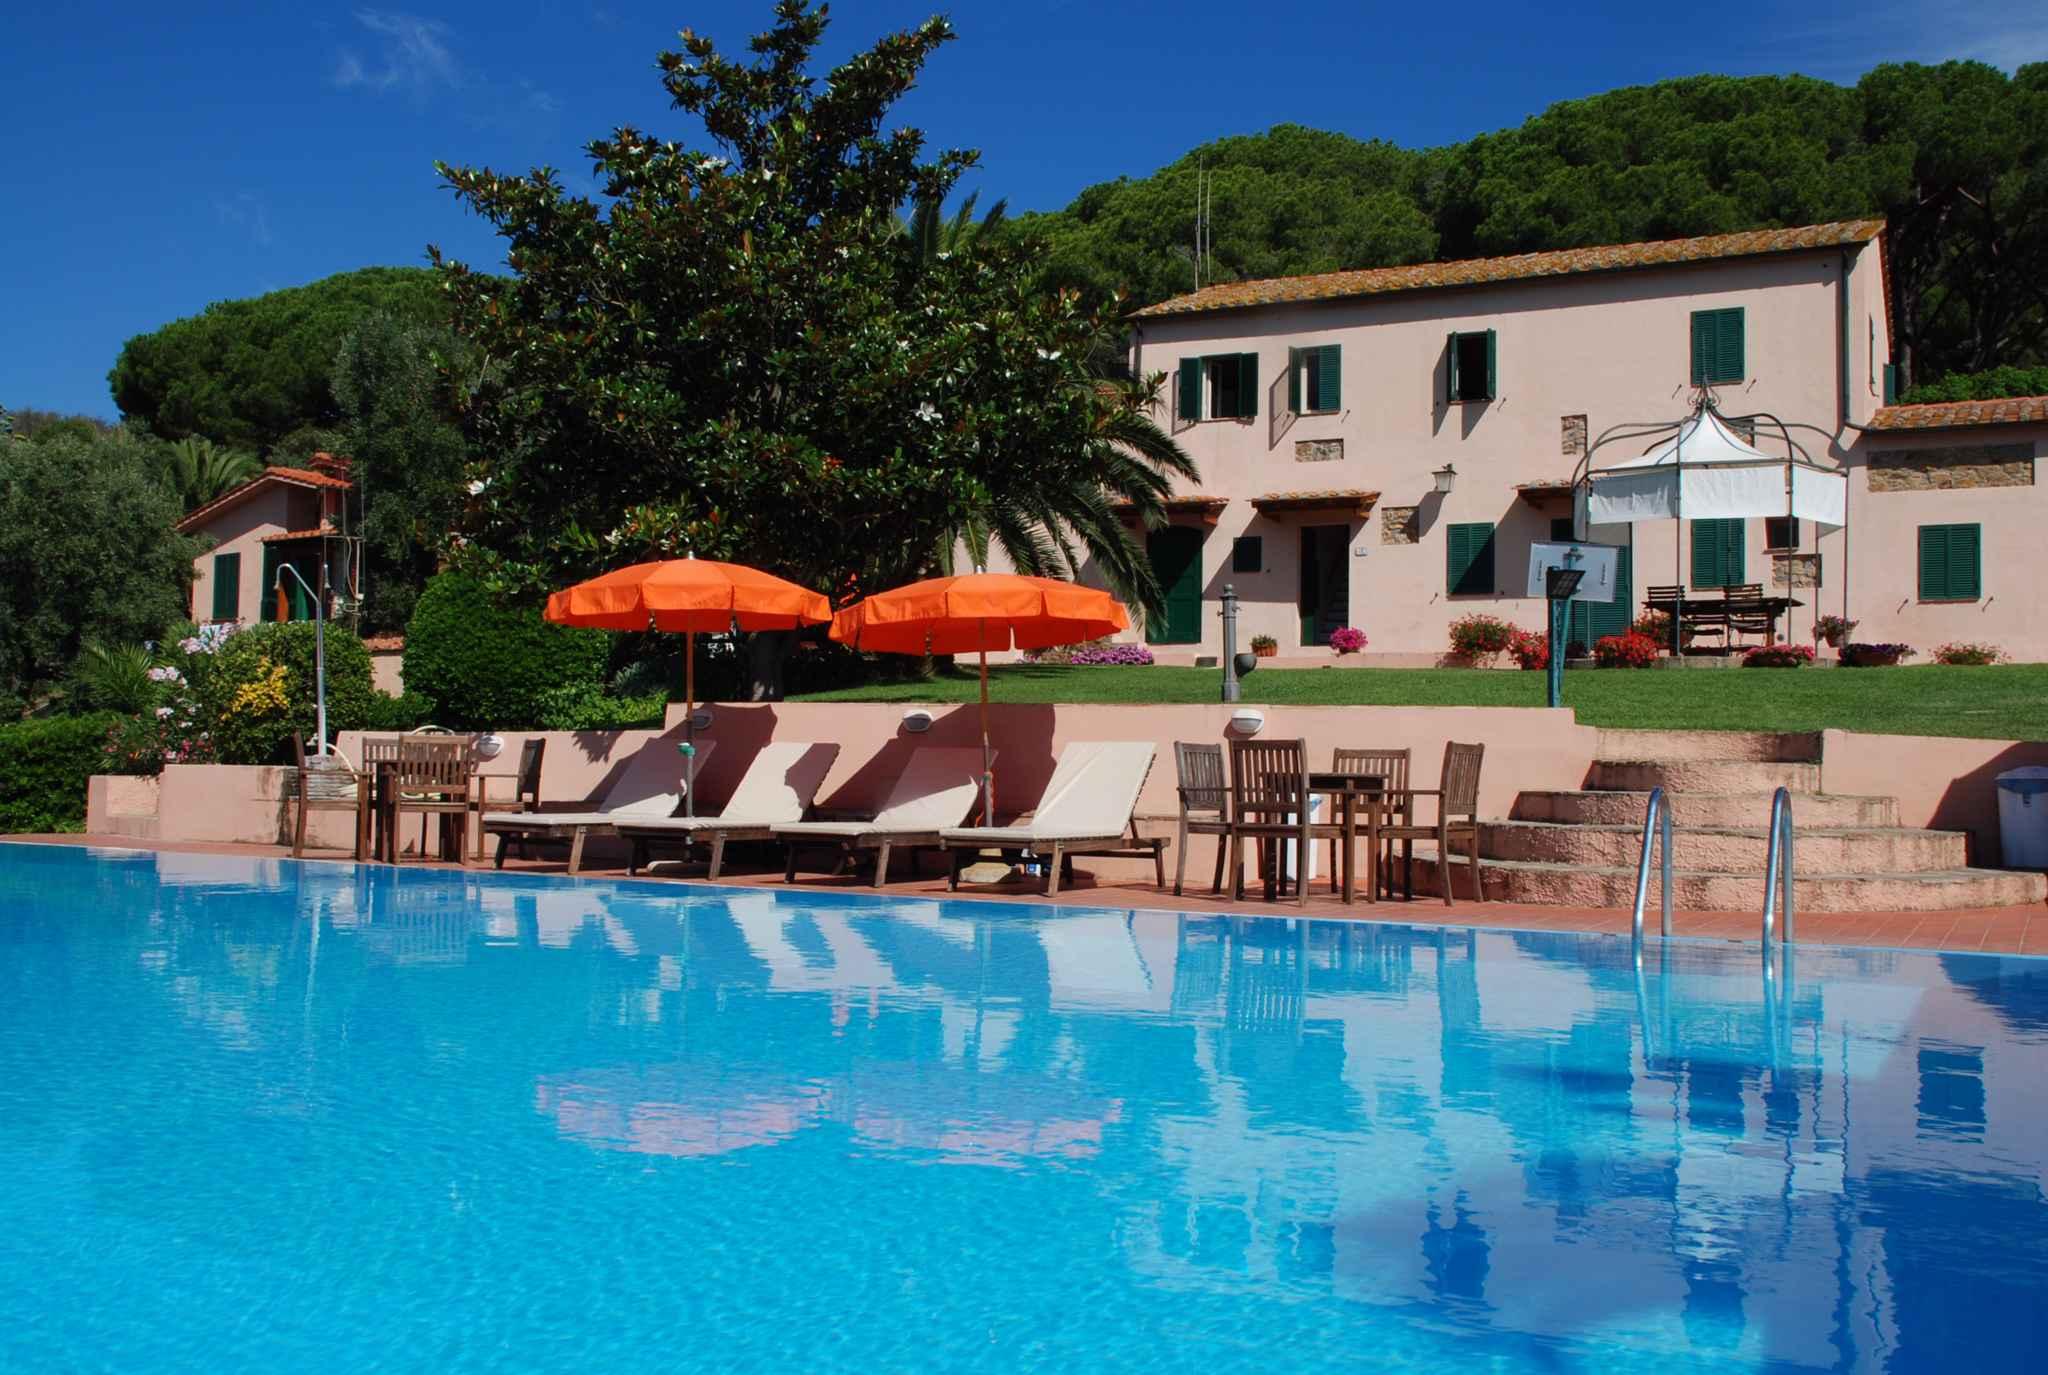 Ferienwohnung Residence della Luna (403269), Porto Azzurro, Elba, Toskana, Italien, Bild 5